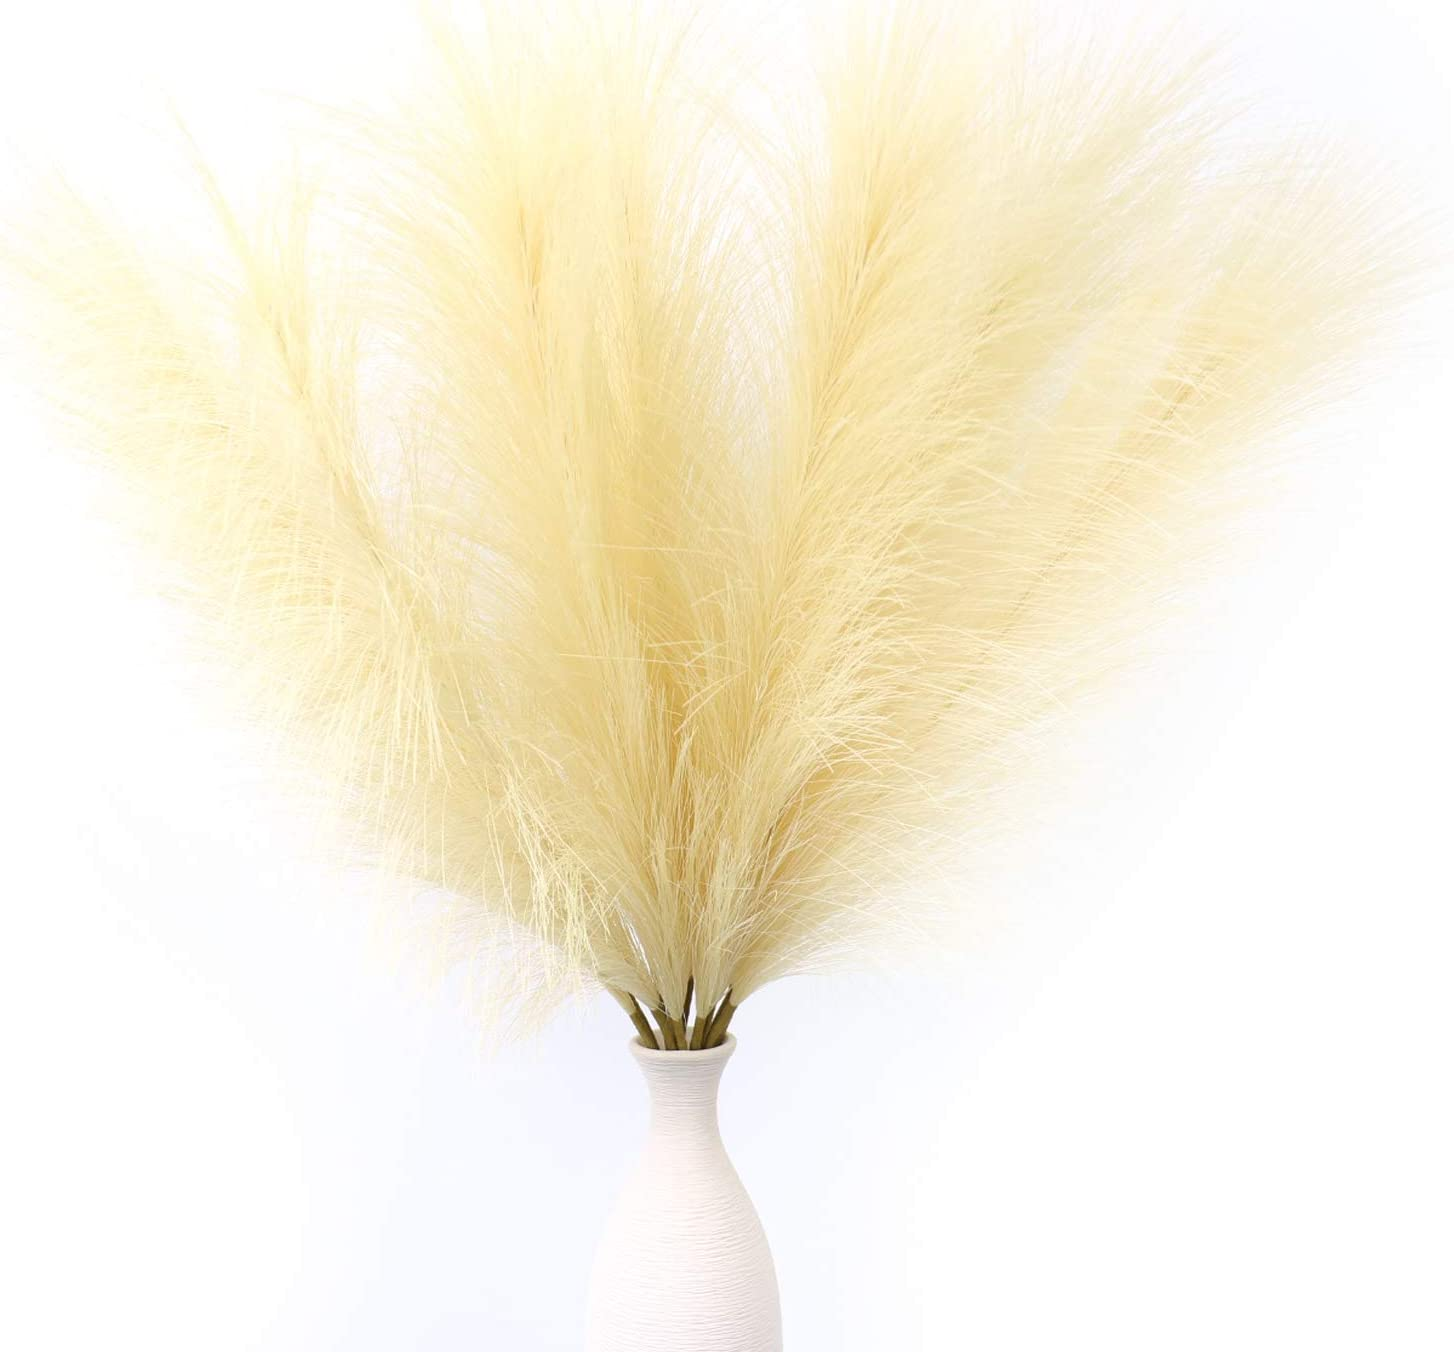 "12 PCS Artificial Pampas Grass,24"" Faux Reed Plumes for Home Wedding Decor Flower Arrangement and Vase Fillings"